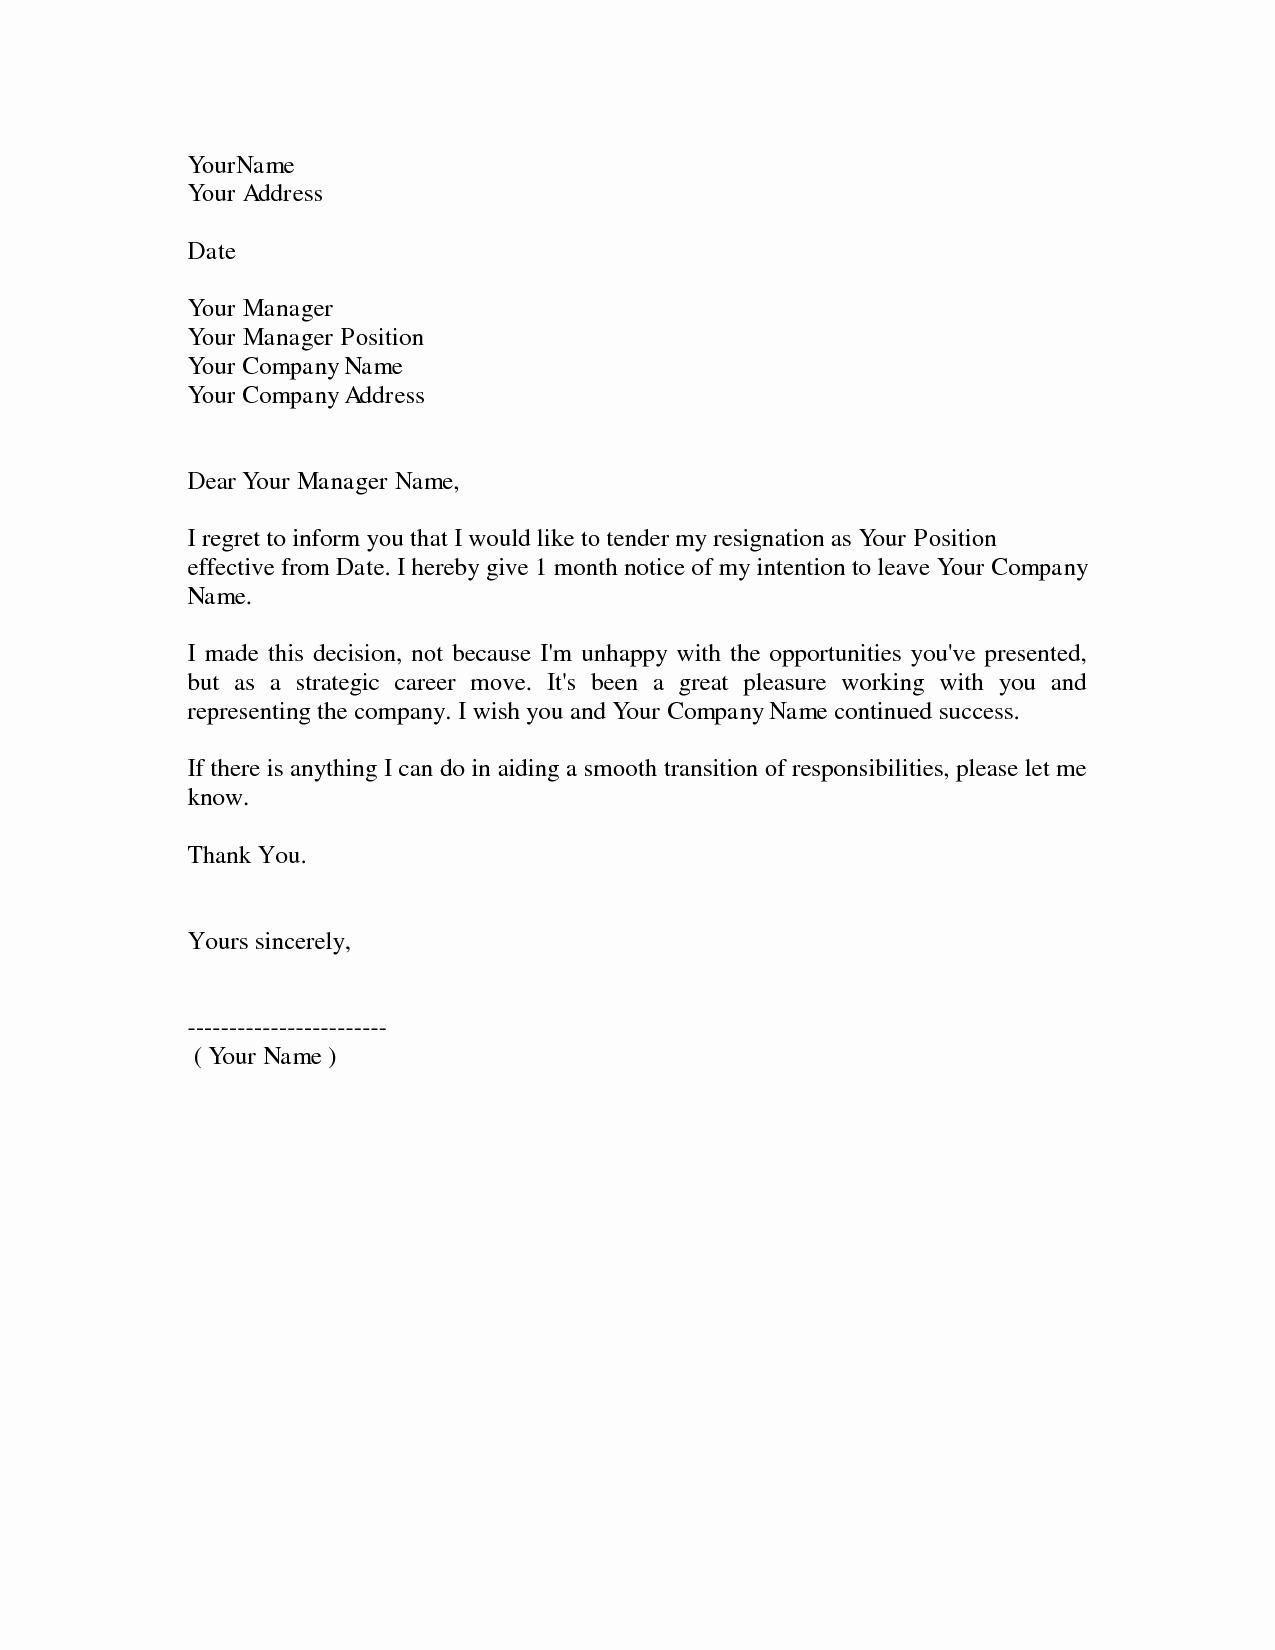 Template for Letter Of Resignation Fresh Resignation Letter Samples 0009 Future Ideas